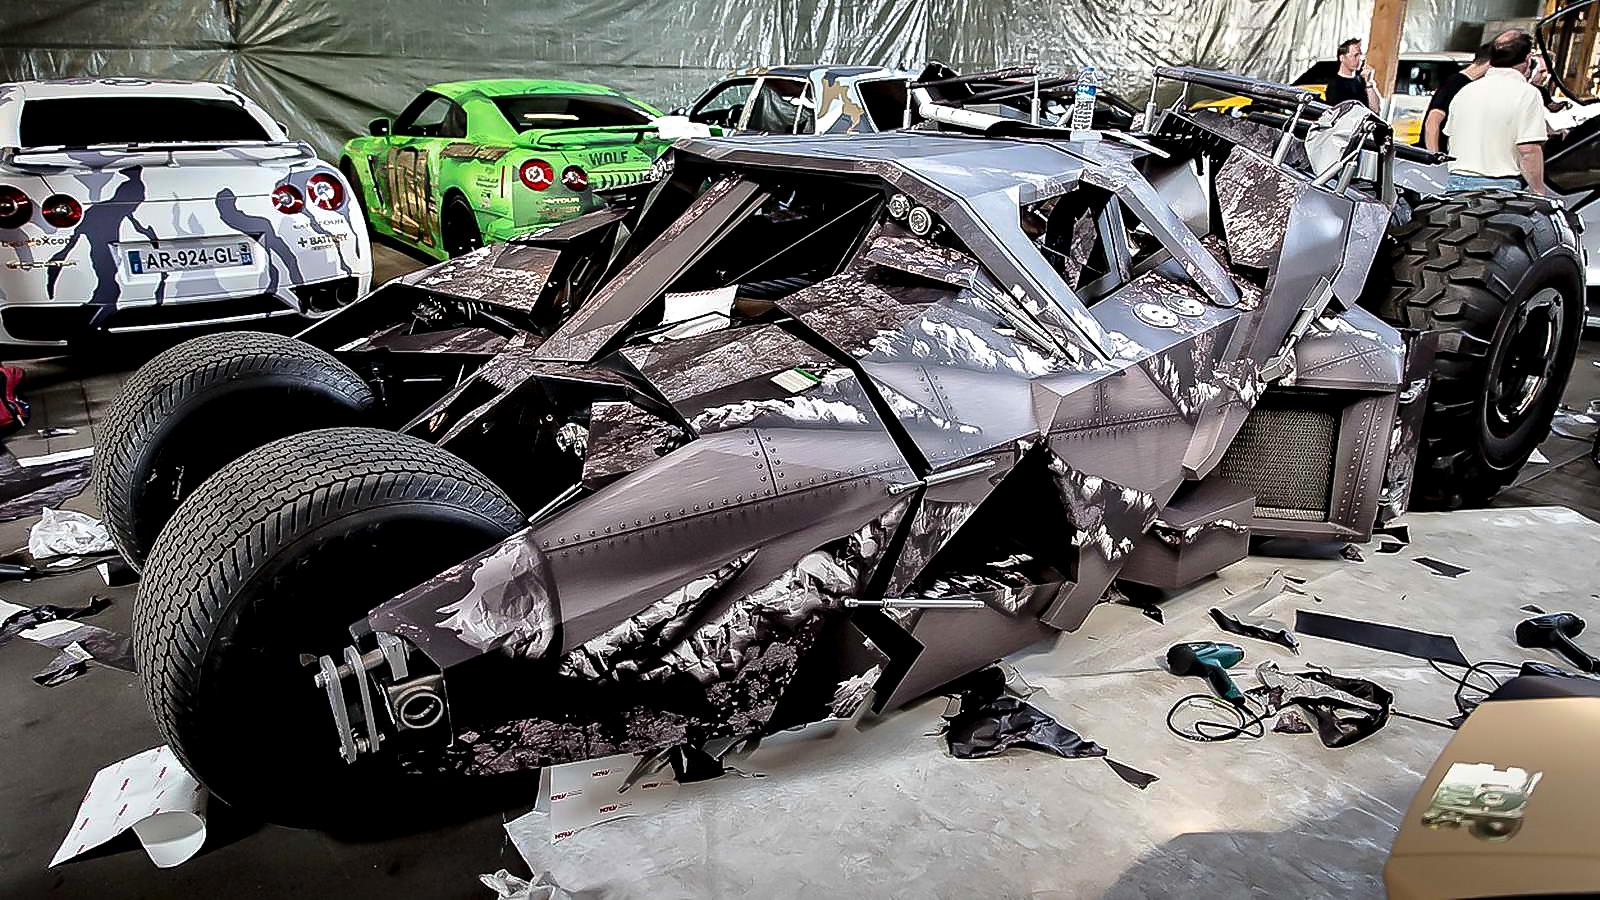 Batmobil Gumball 3000 wrap